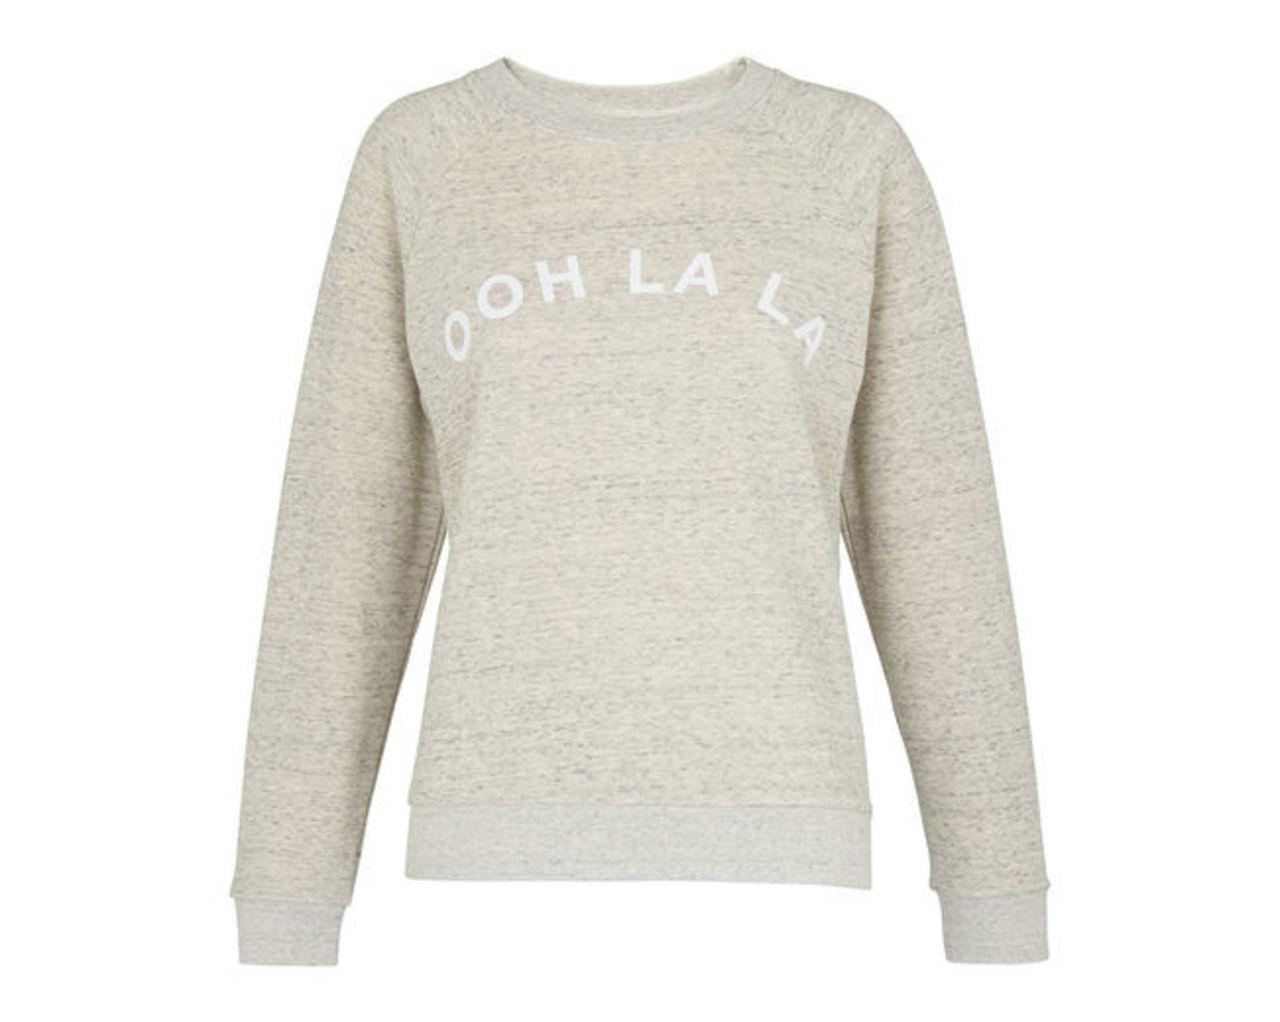 Ooh La La Sweatshirt